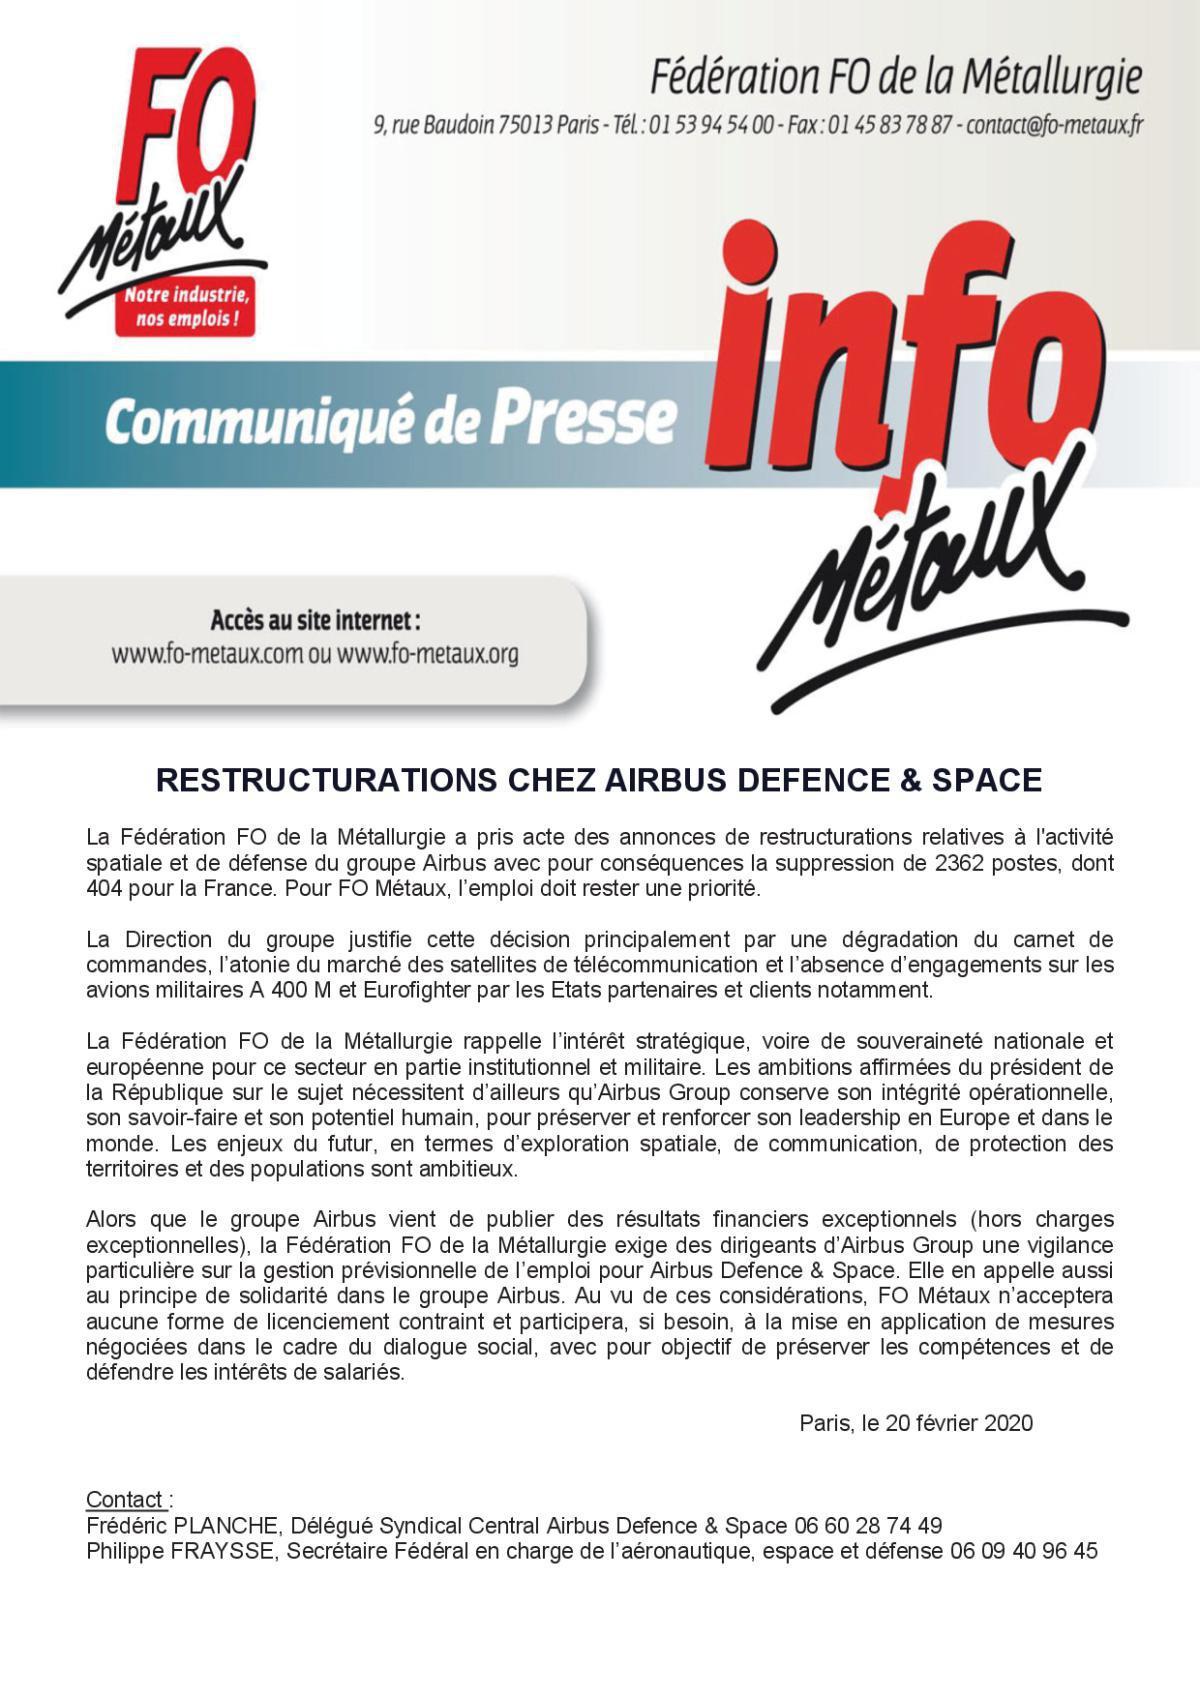 FO METAUX COMMUNIQUE DE PRESSE AIRBUS GROUP